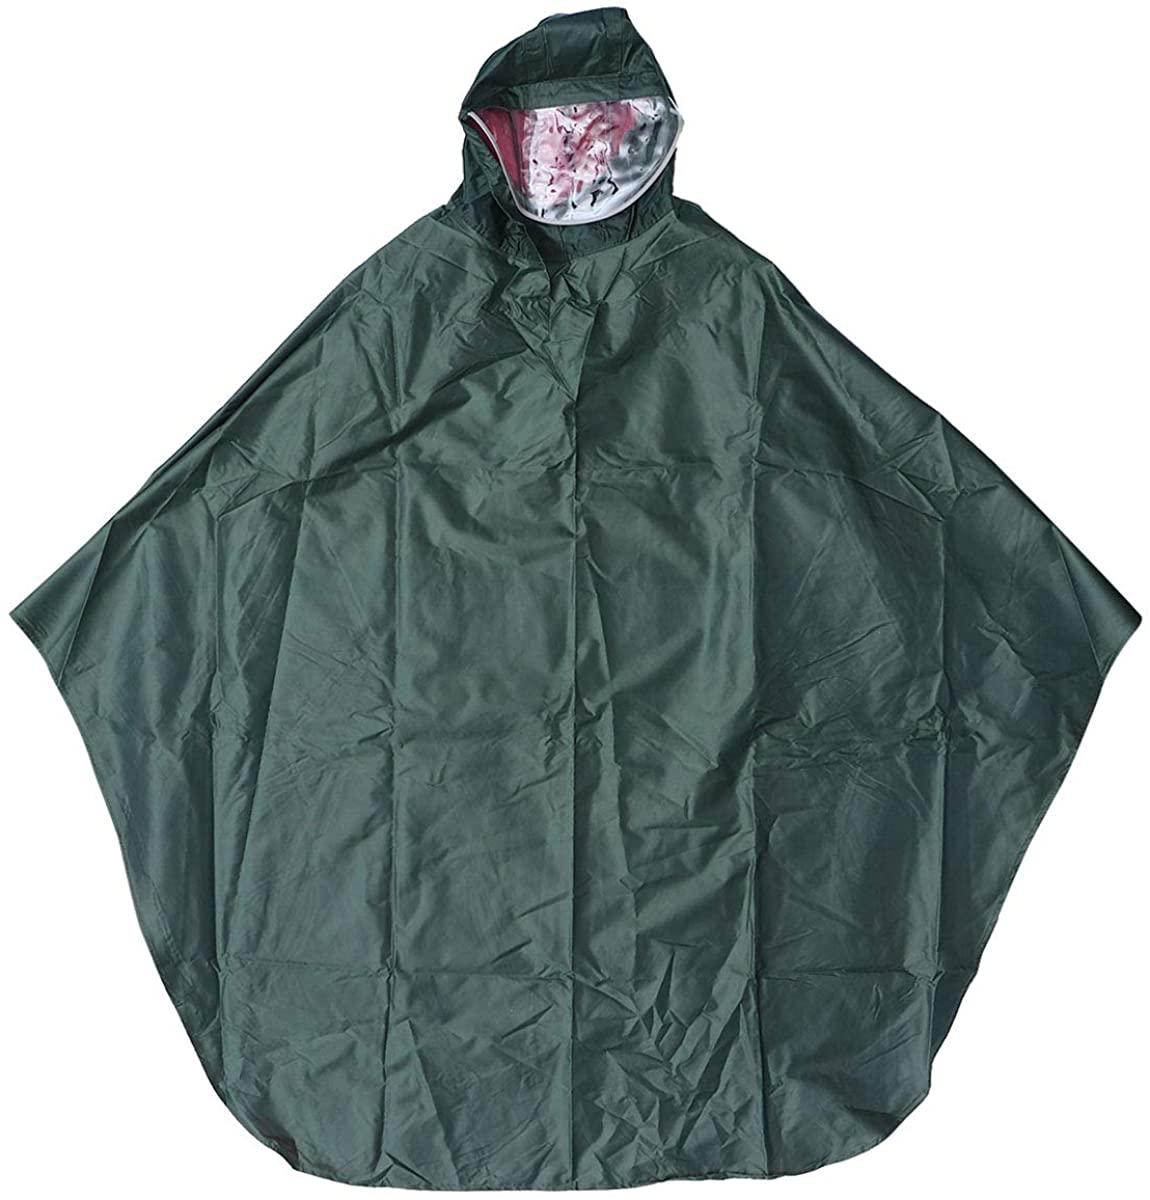 VORCOOL Waterproof Rain Poncho Lightweight Reusable Hiking Rain Coat Jacket with Hood for Boys Men Women Adults